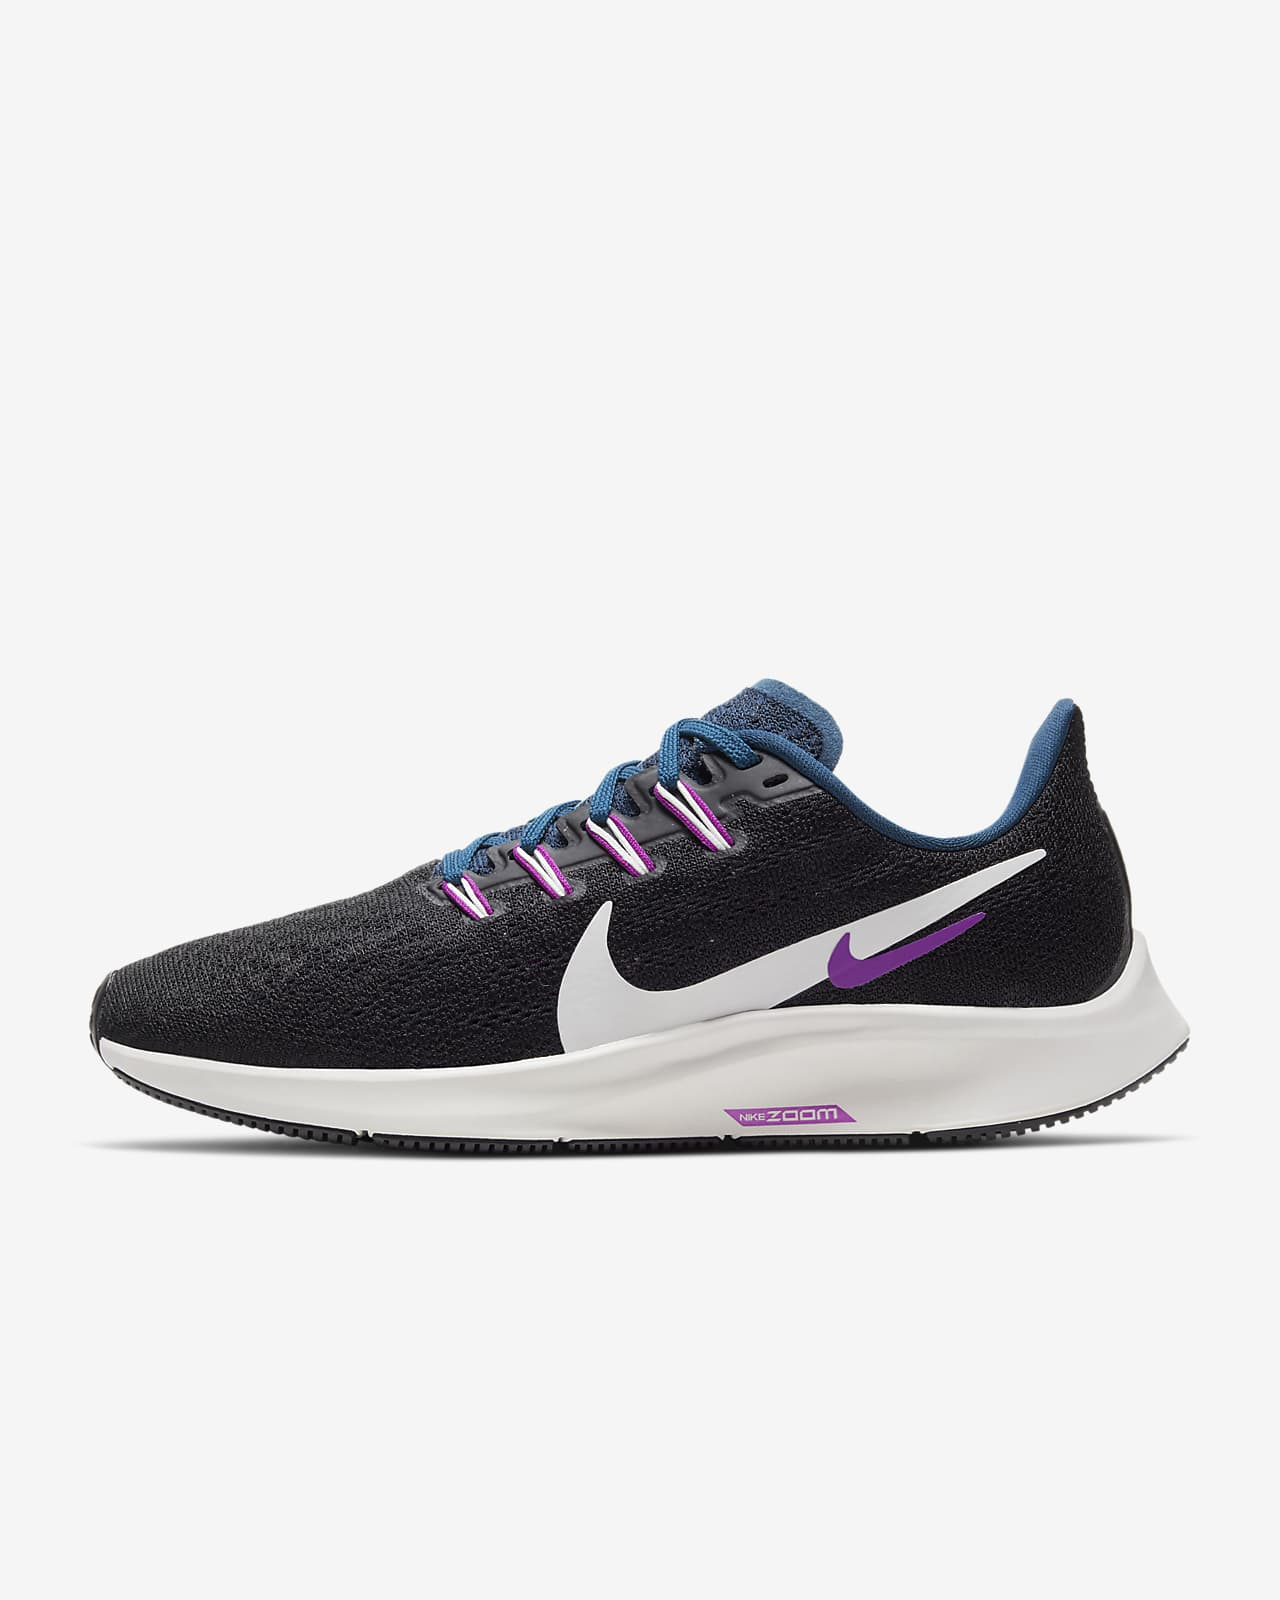 complicaciones Caligrafía Derivar  Calzado de running para mujer Nike Air Zoom Pegasus 36. Nike.com